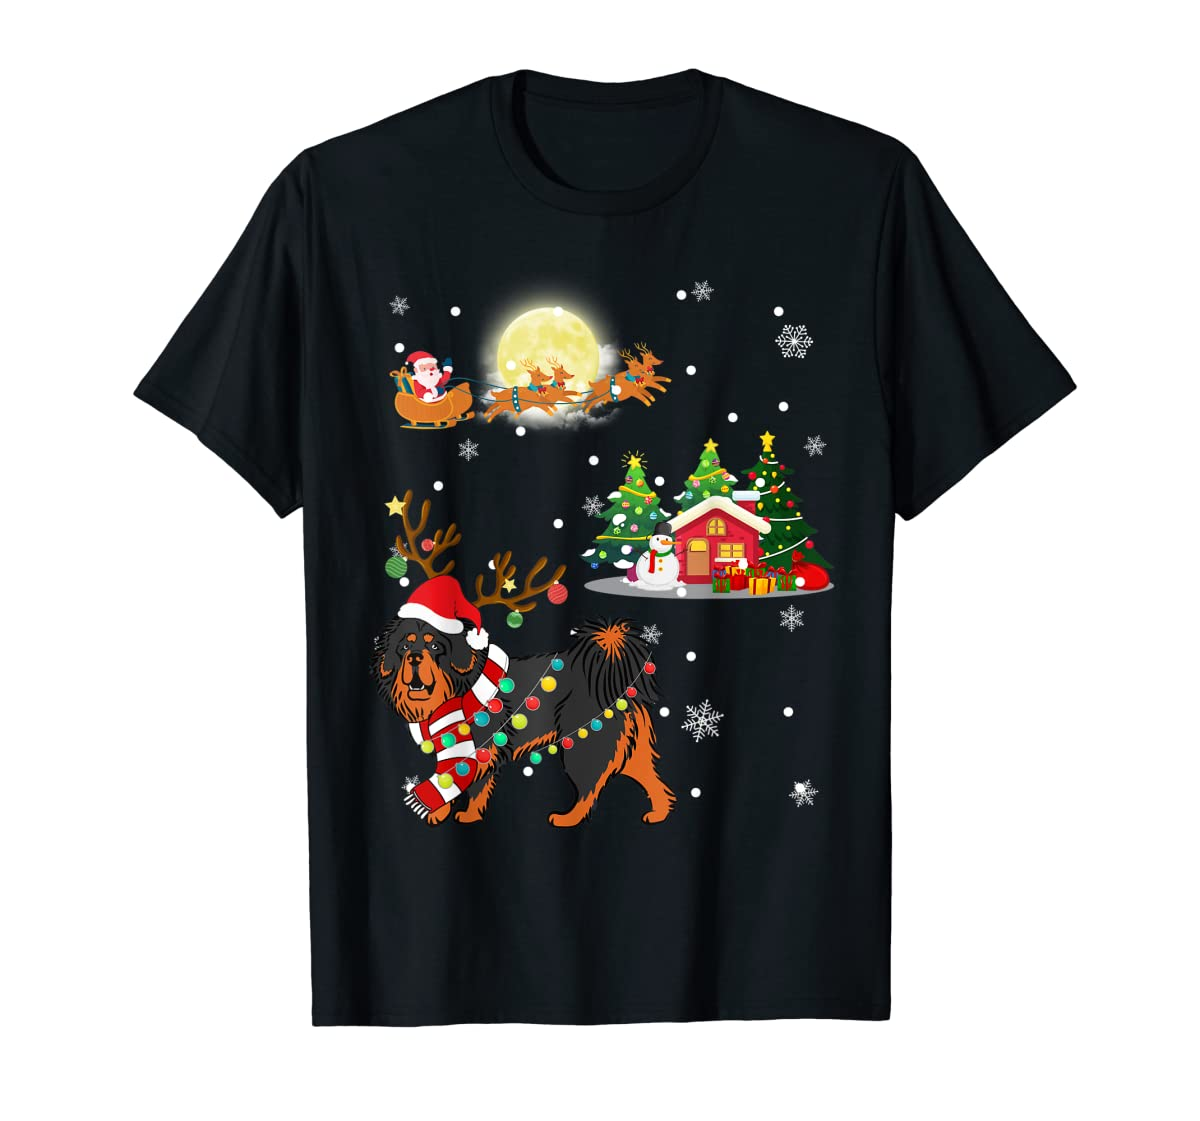 Tibetan Mastiff Dog Led Light Christmas 2019 Gift T-Shirt-Men's T-Shirt-Black